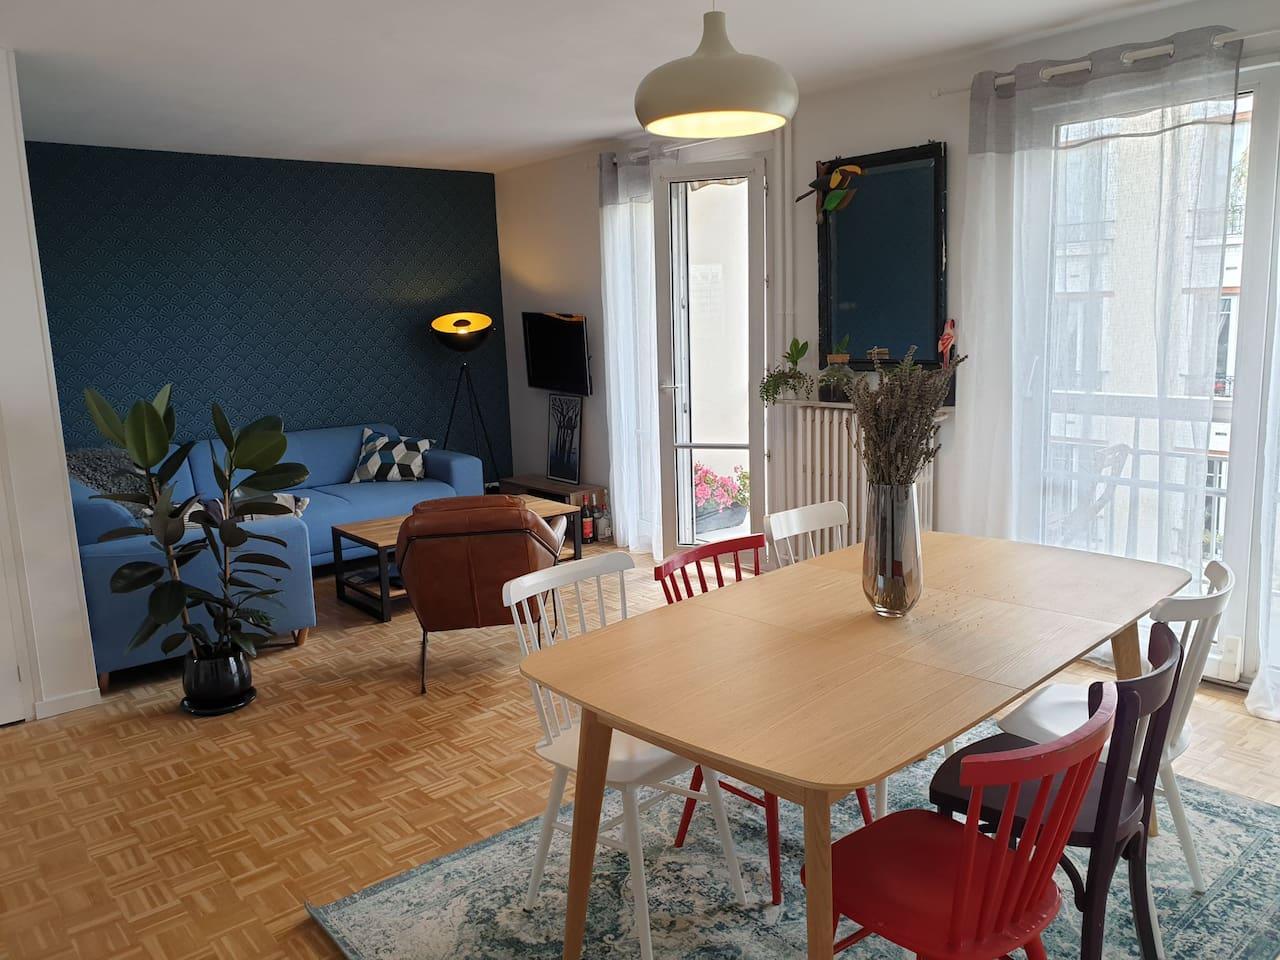 Salon canapé 5 places/ living-room with a 5 seats sofa